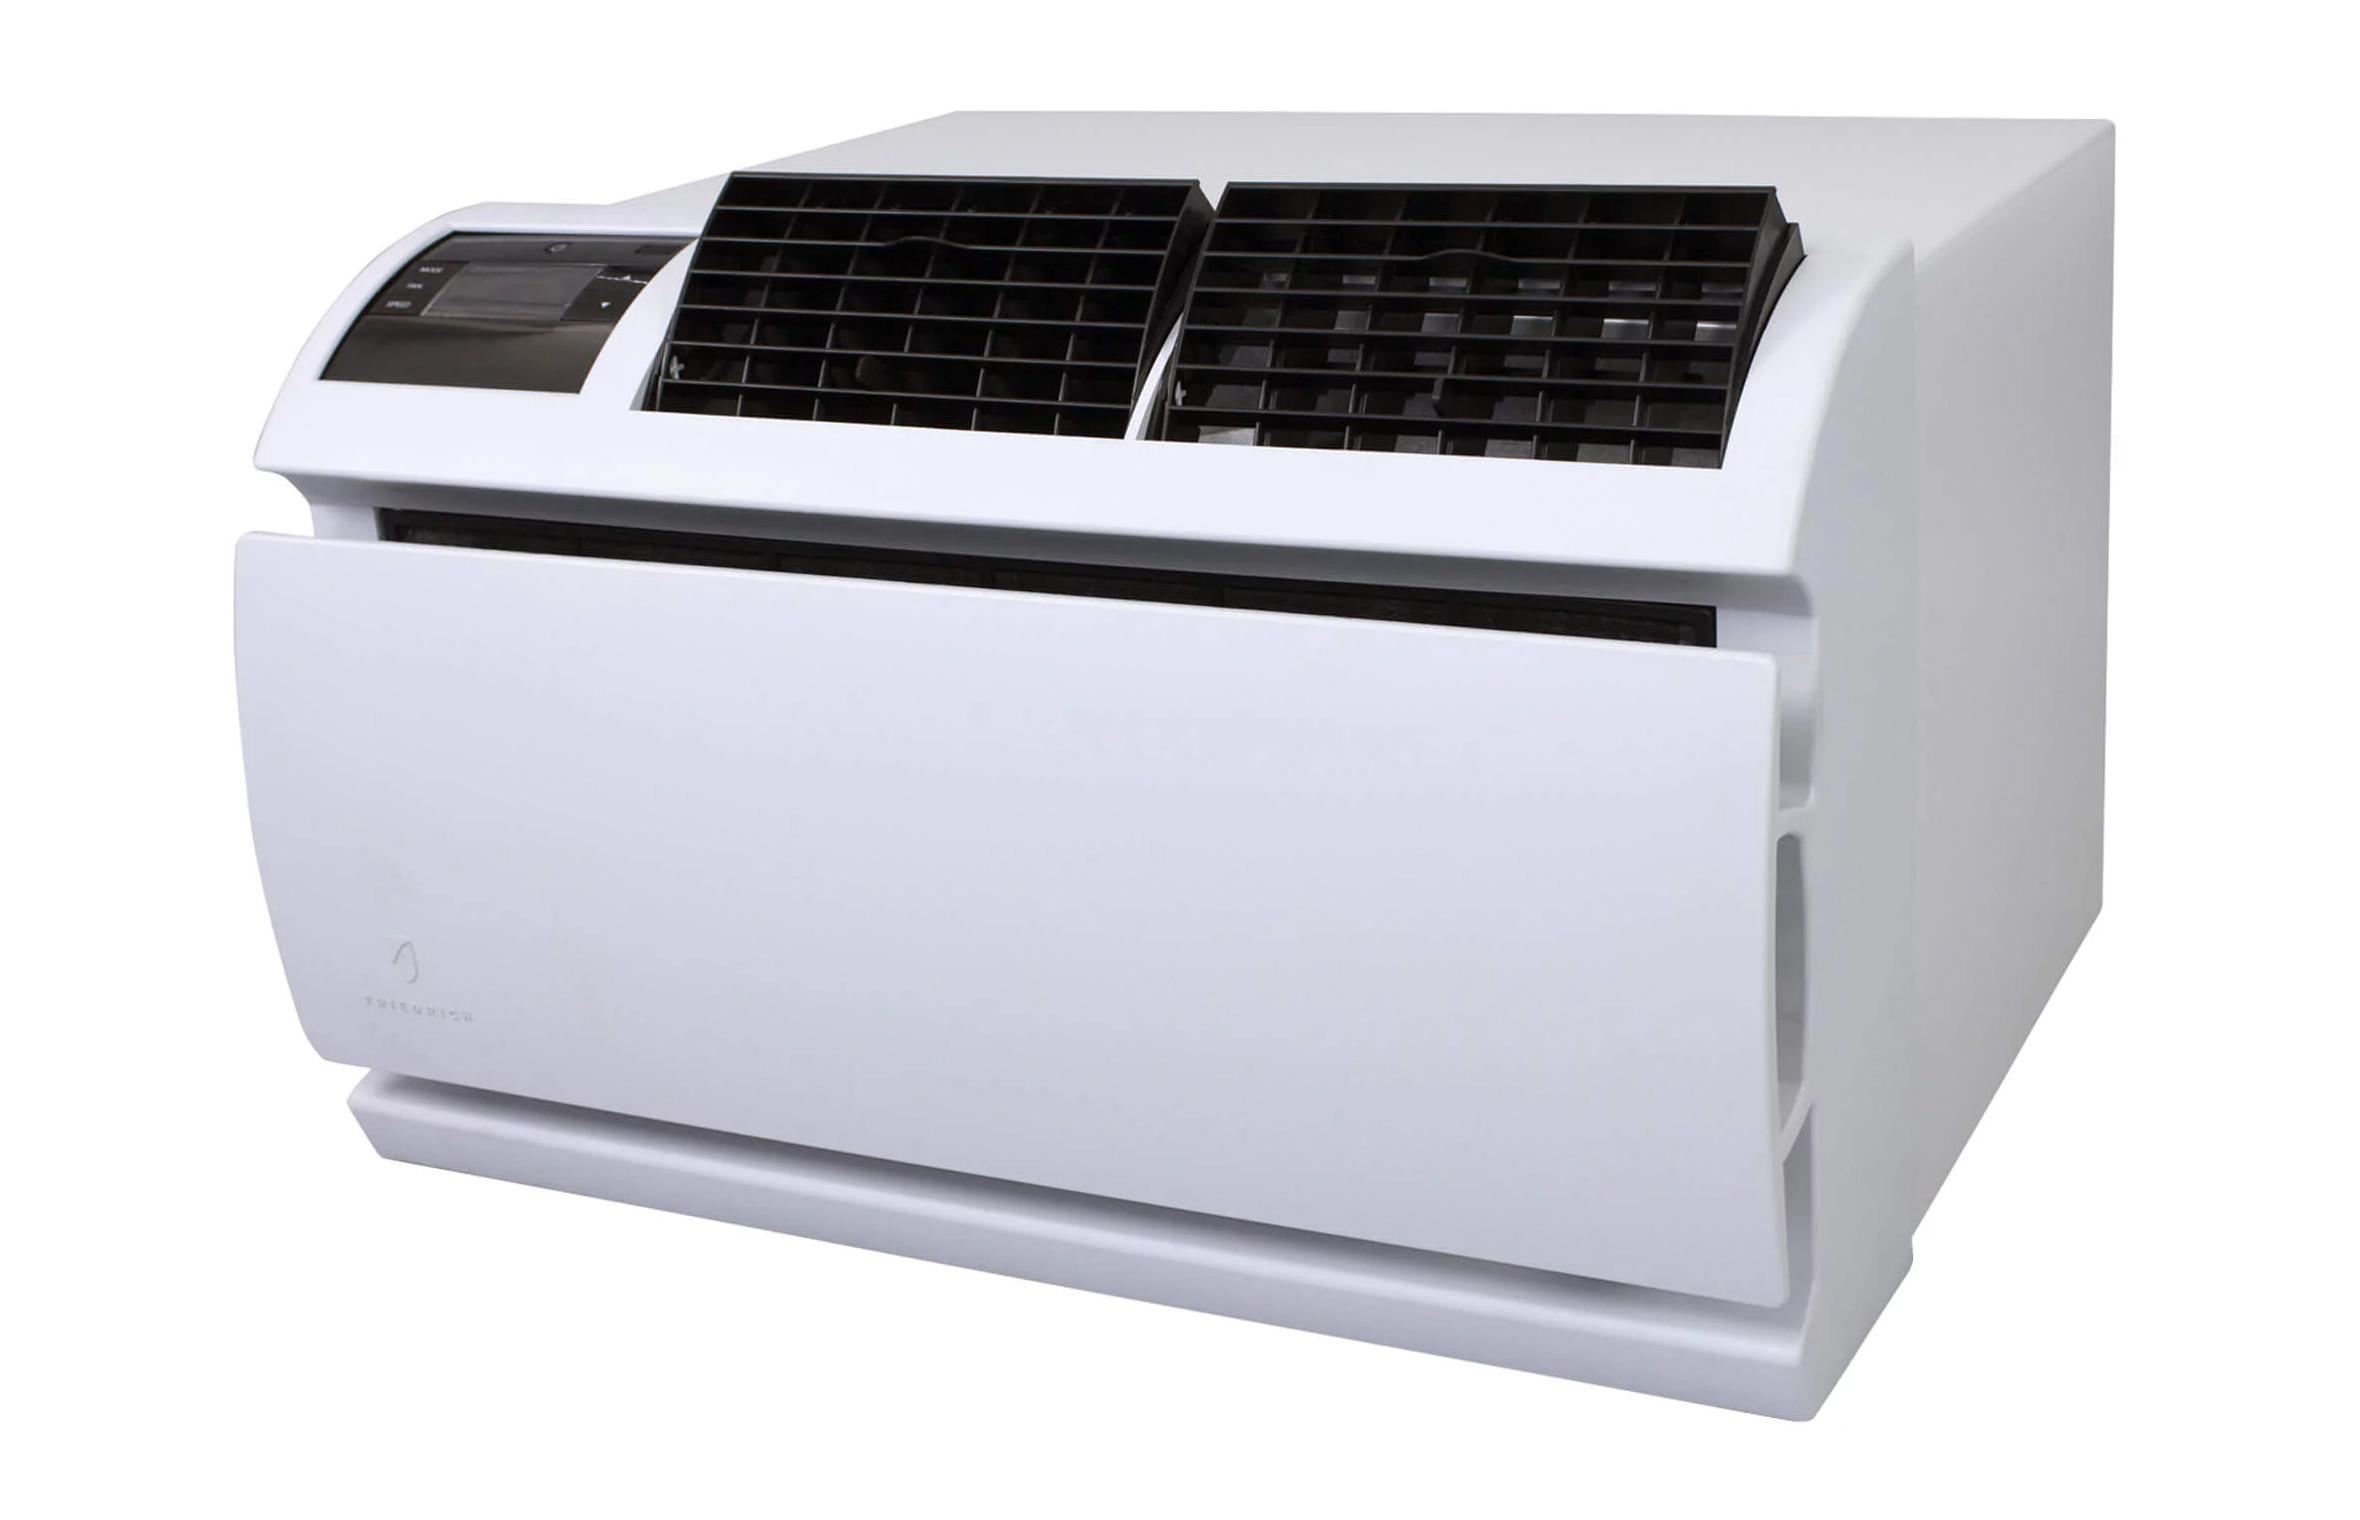 Friedrich WET16A33A Wallmaster Series 15400 BTU Smart WiFi Through-the-Wall Air Conditioner with Electric Heat - 208/230 Volt